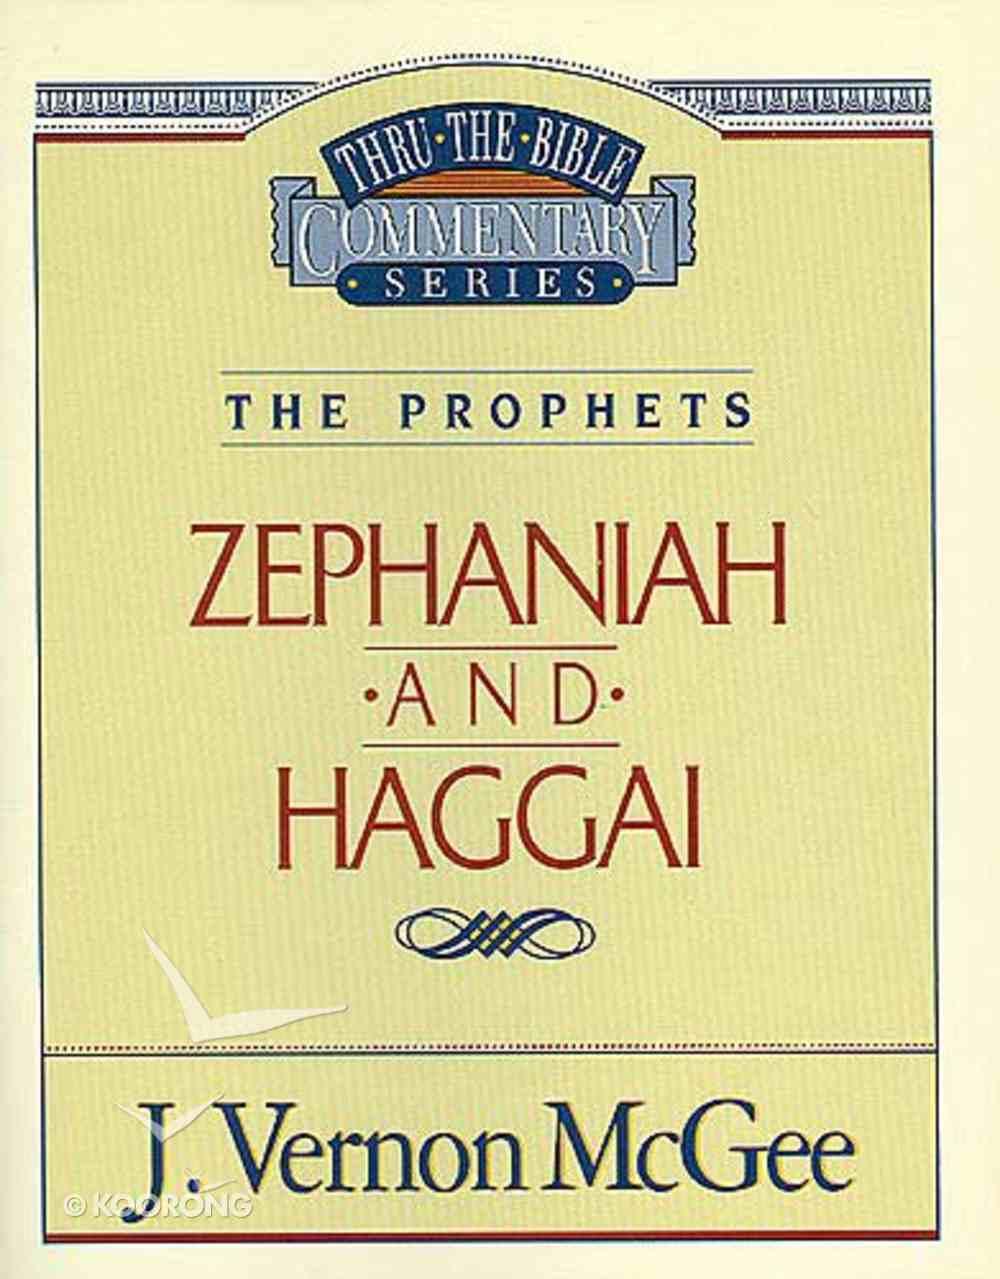 Thru the Bible OT #31: Zephaniah/Haggai (#31 in Thru The Bible Old Testament Series) Paperback